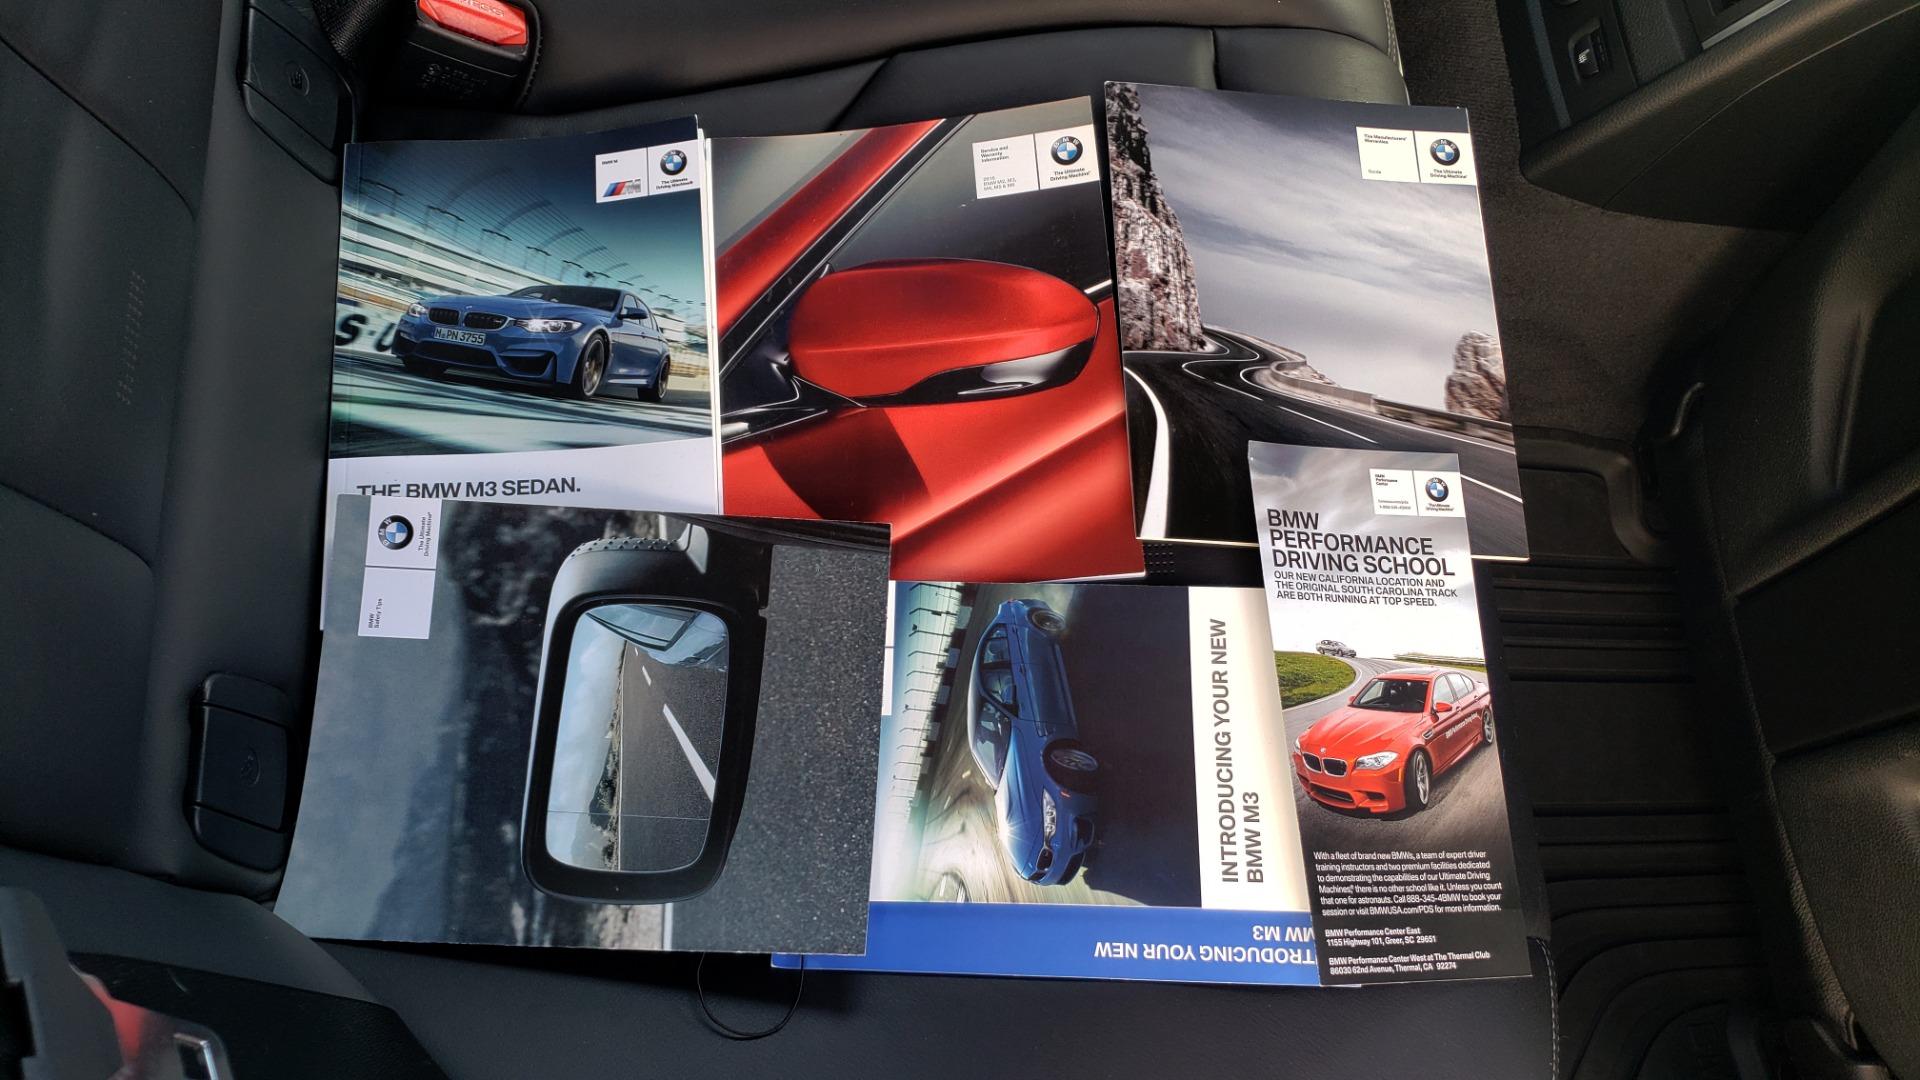 Used 2016 BMW M3 SEDAN / EXECUTIVE PKG / M-SUSPENSION / HARMAN/KARDON SOUND for sale Sold at Formula Imports in Charlotte NC 28227 88